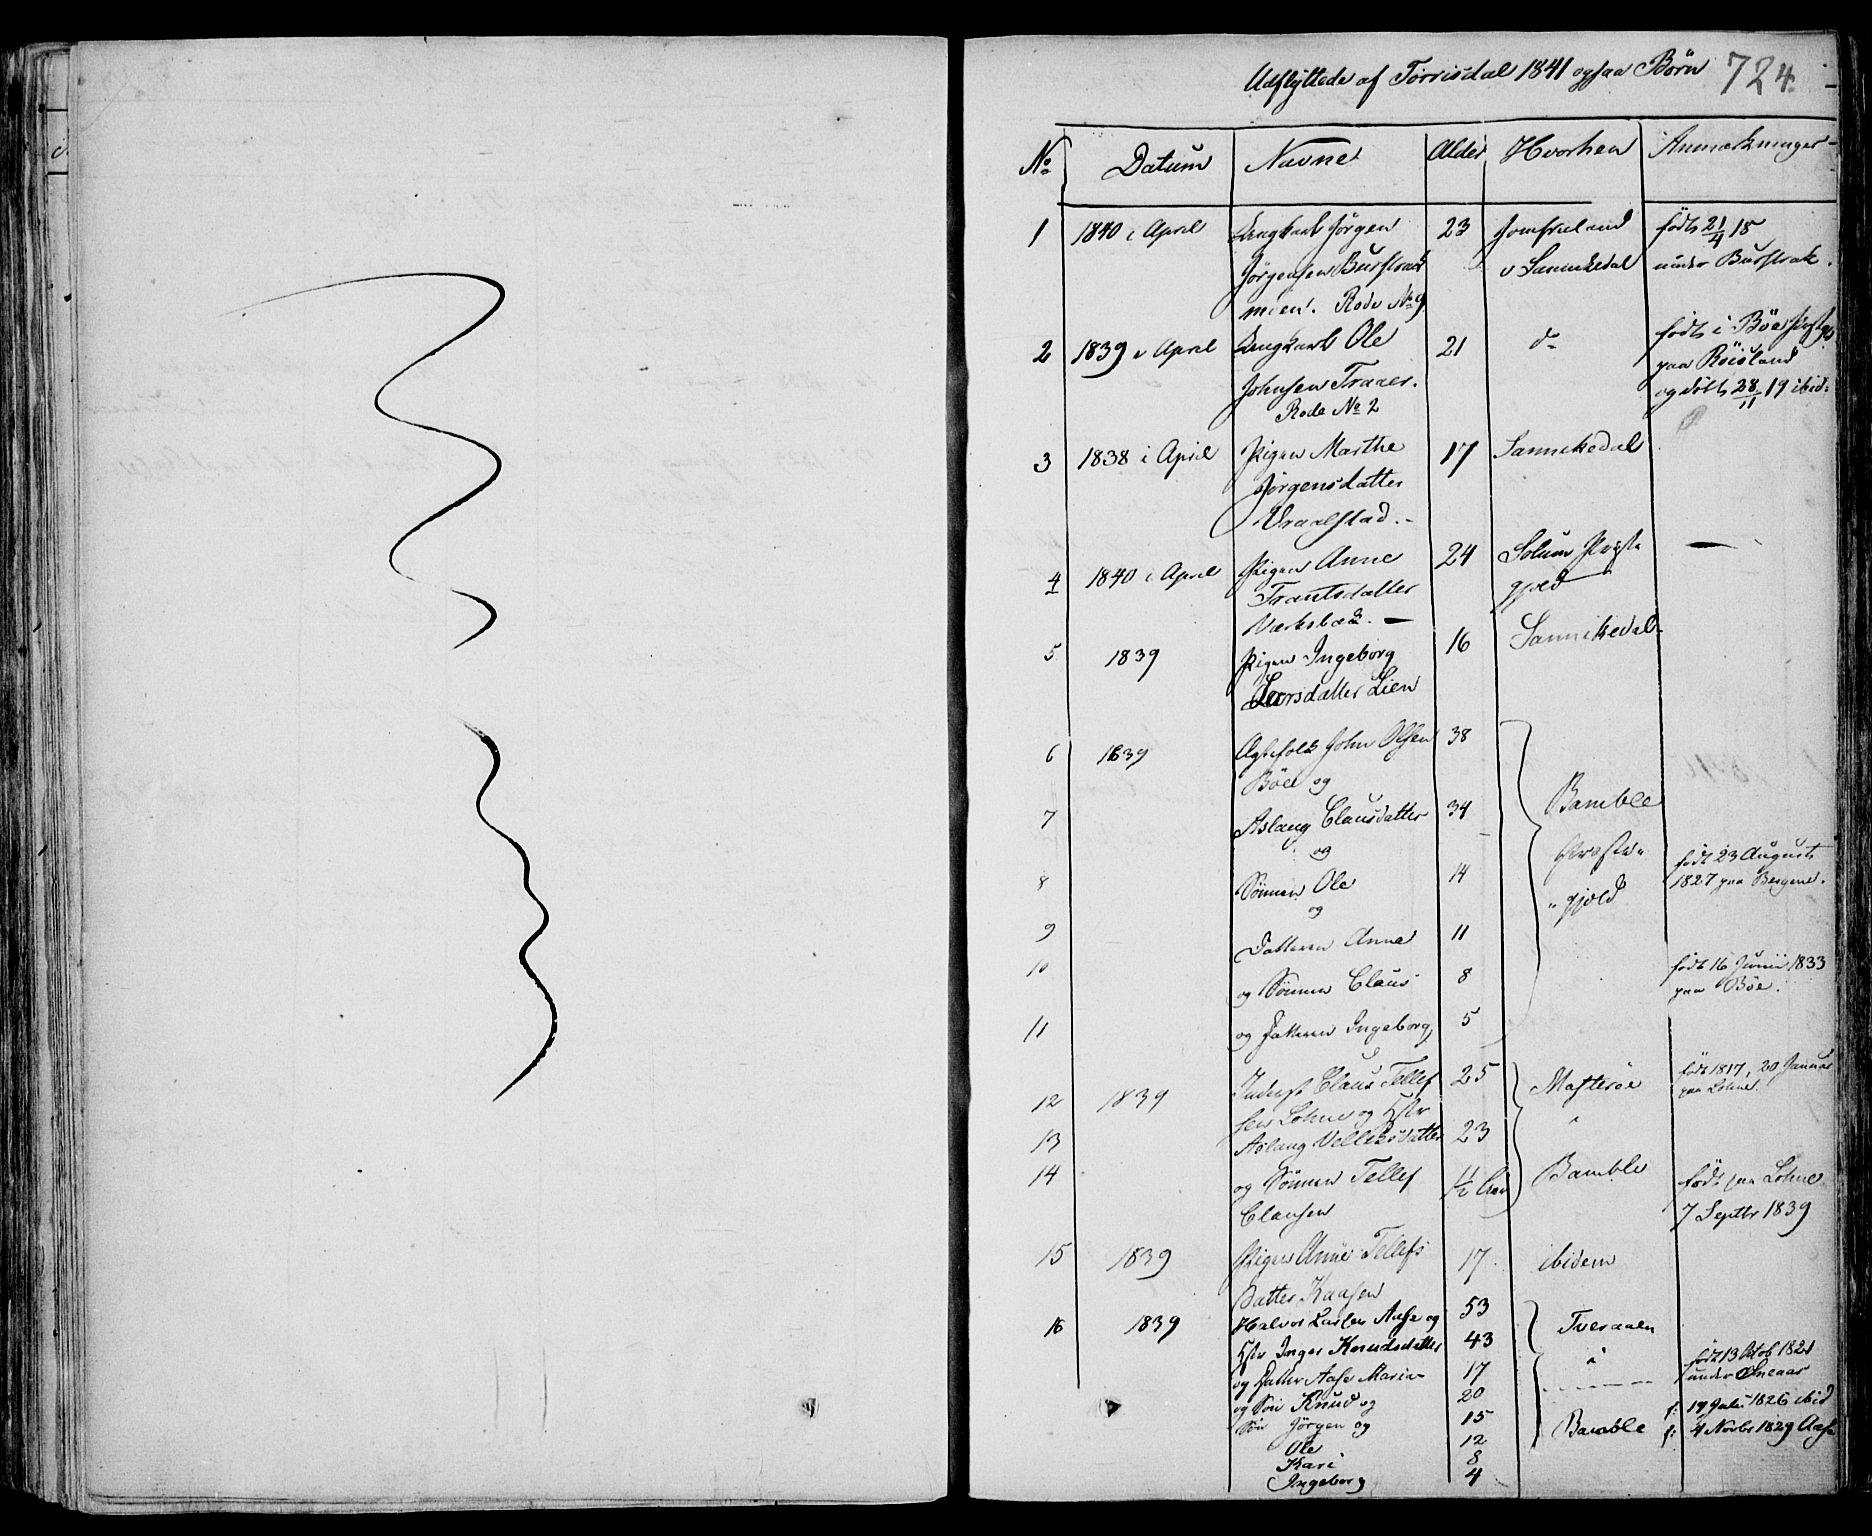 SAKO, Drangedal kirkebøker, F/Fa/L0007b: Ministerialbok nr. 7b, 1837-1856, s. 724